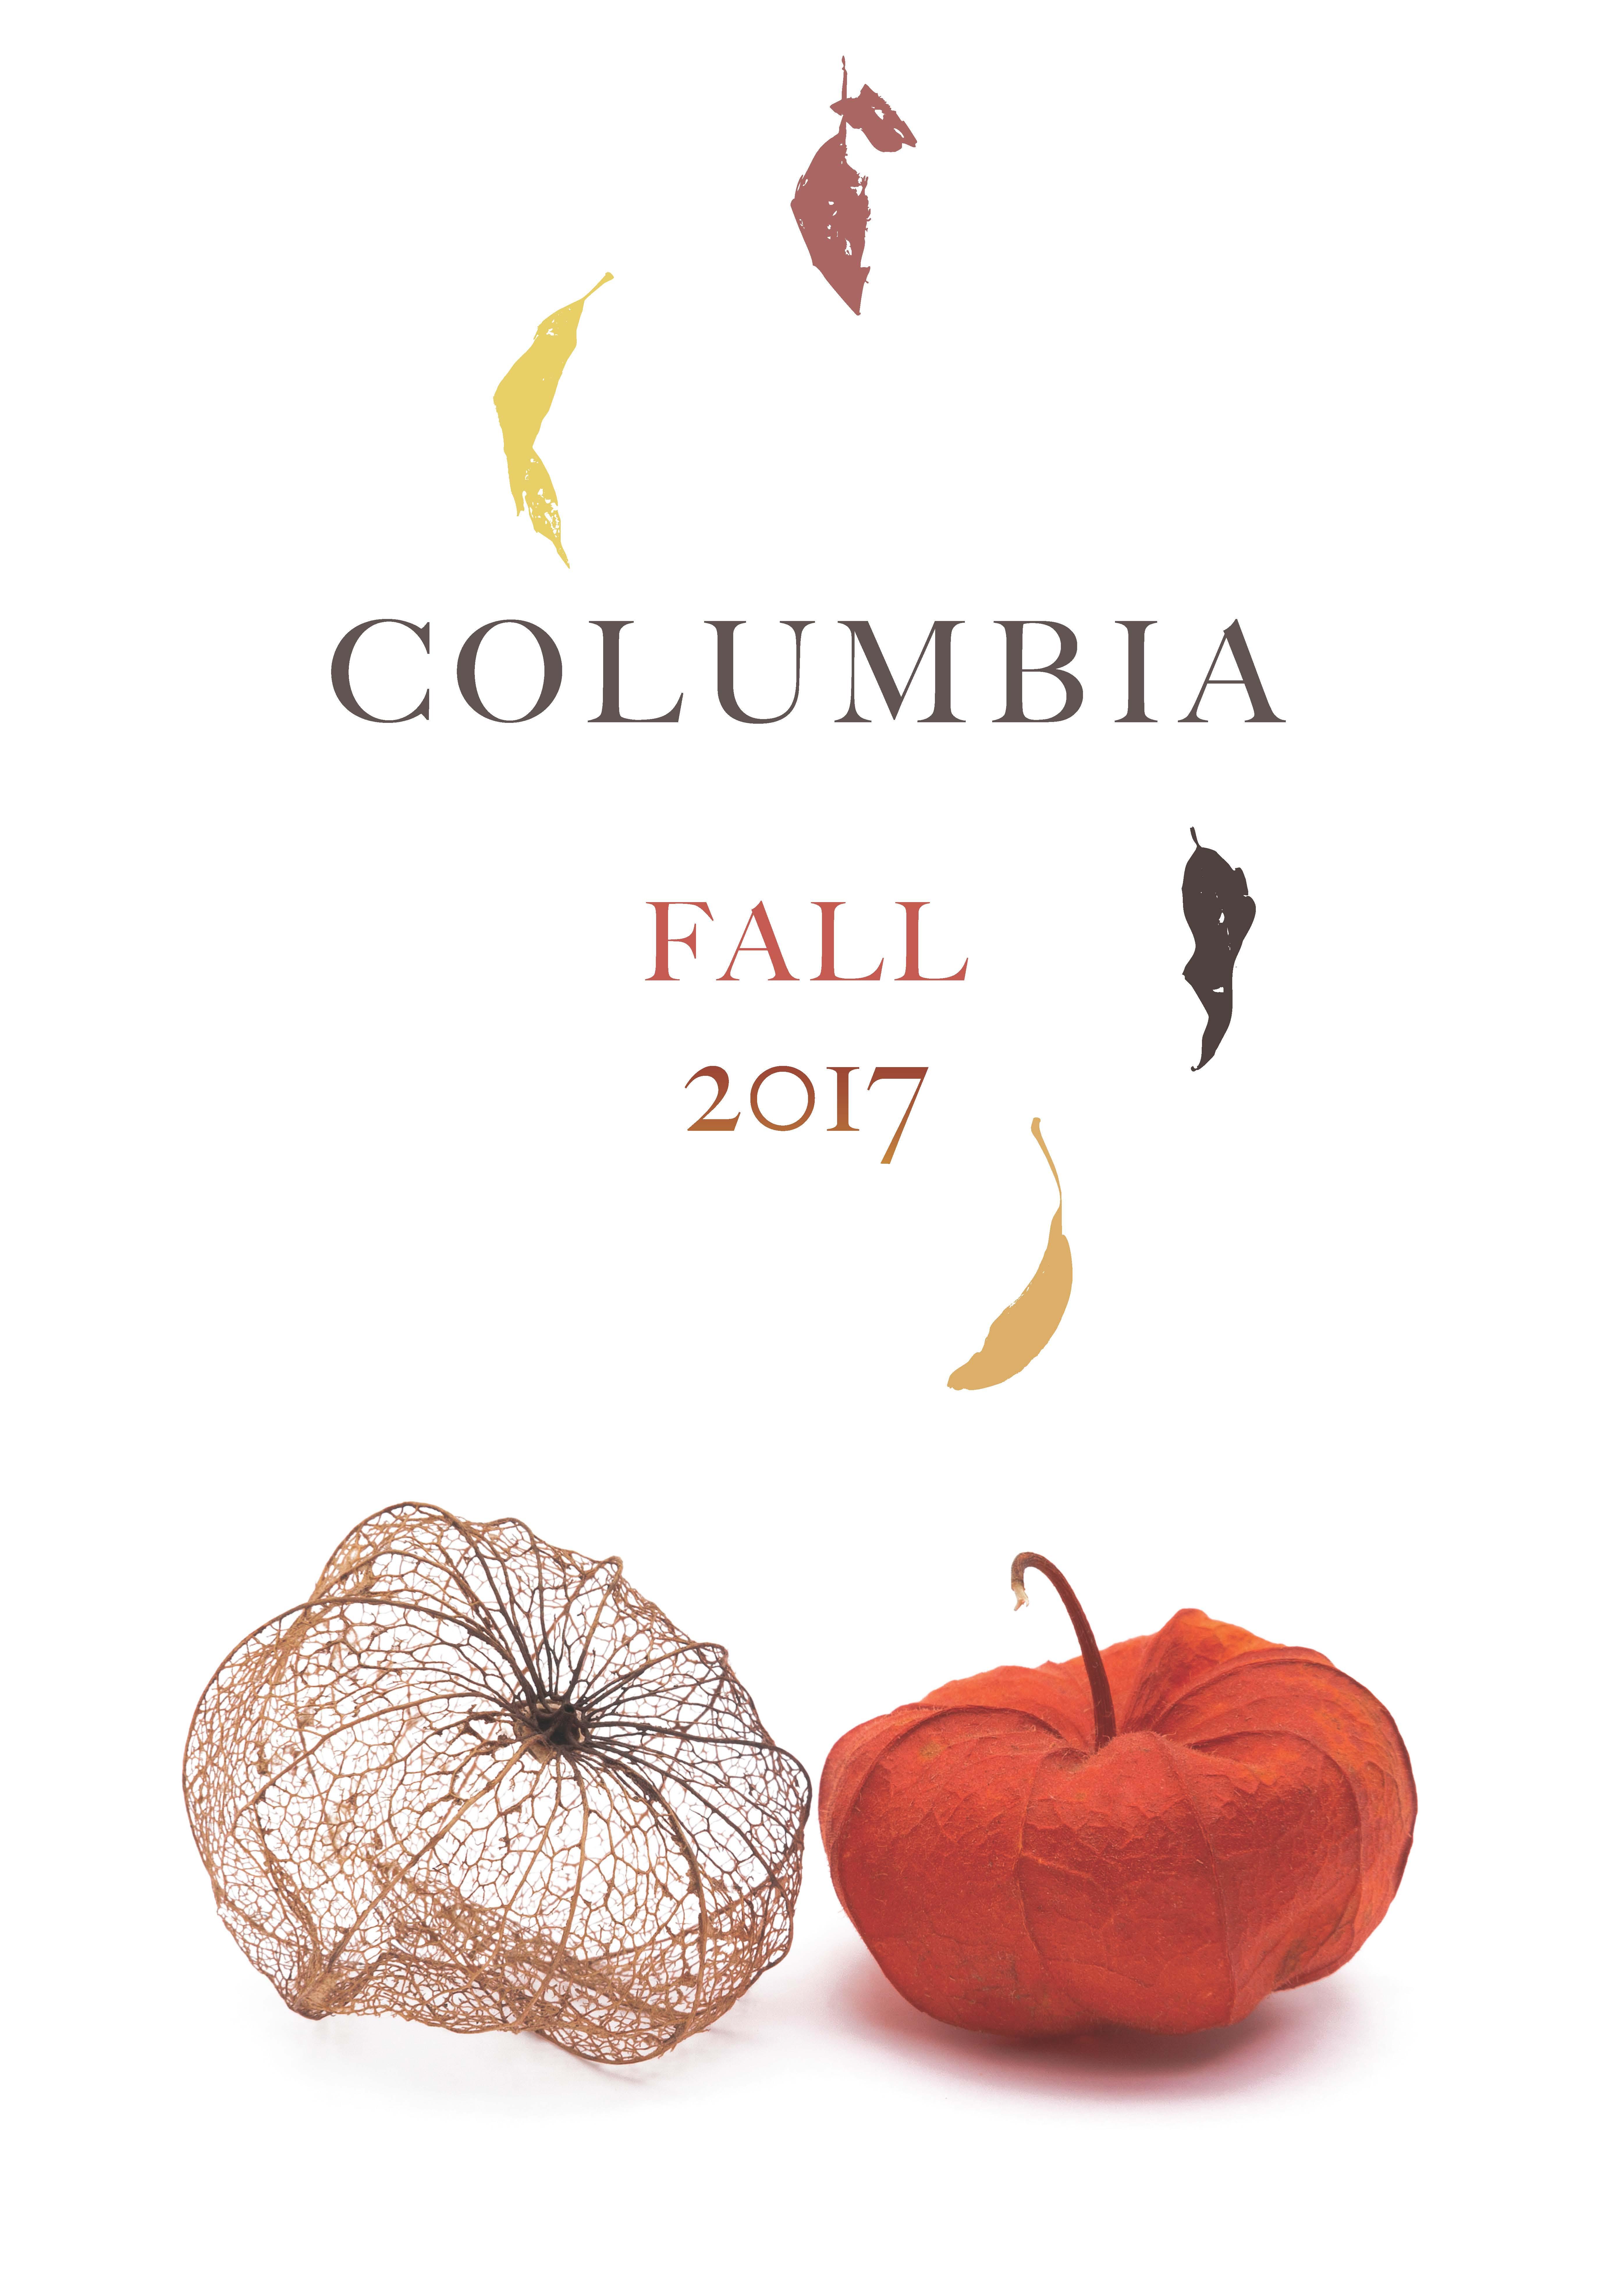 Columbia UP Fall 2017 Catalog